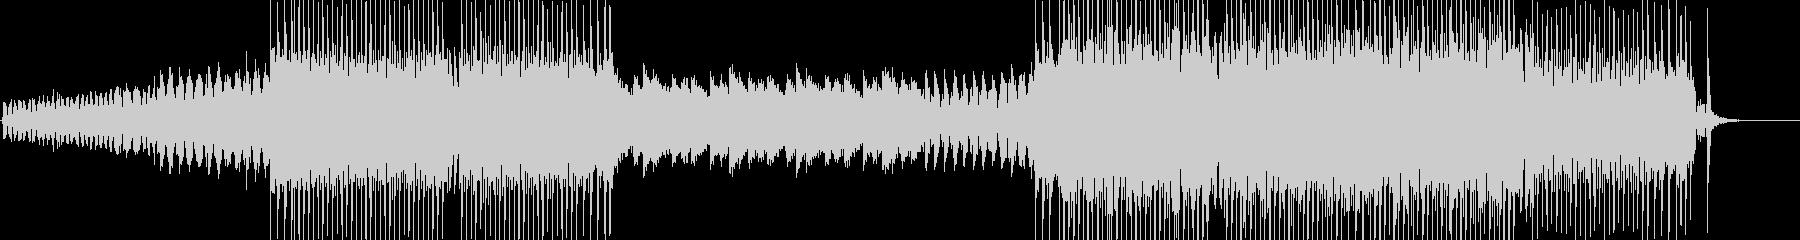 EDMでトランス風の曲の未再生の波形